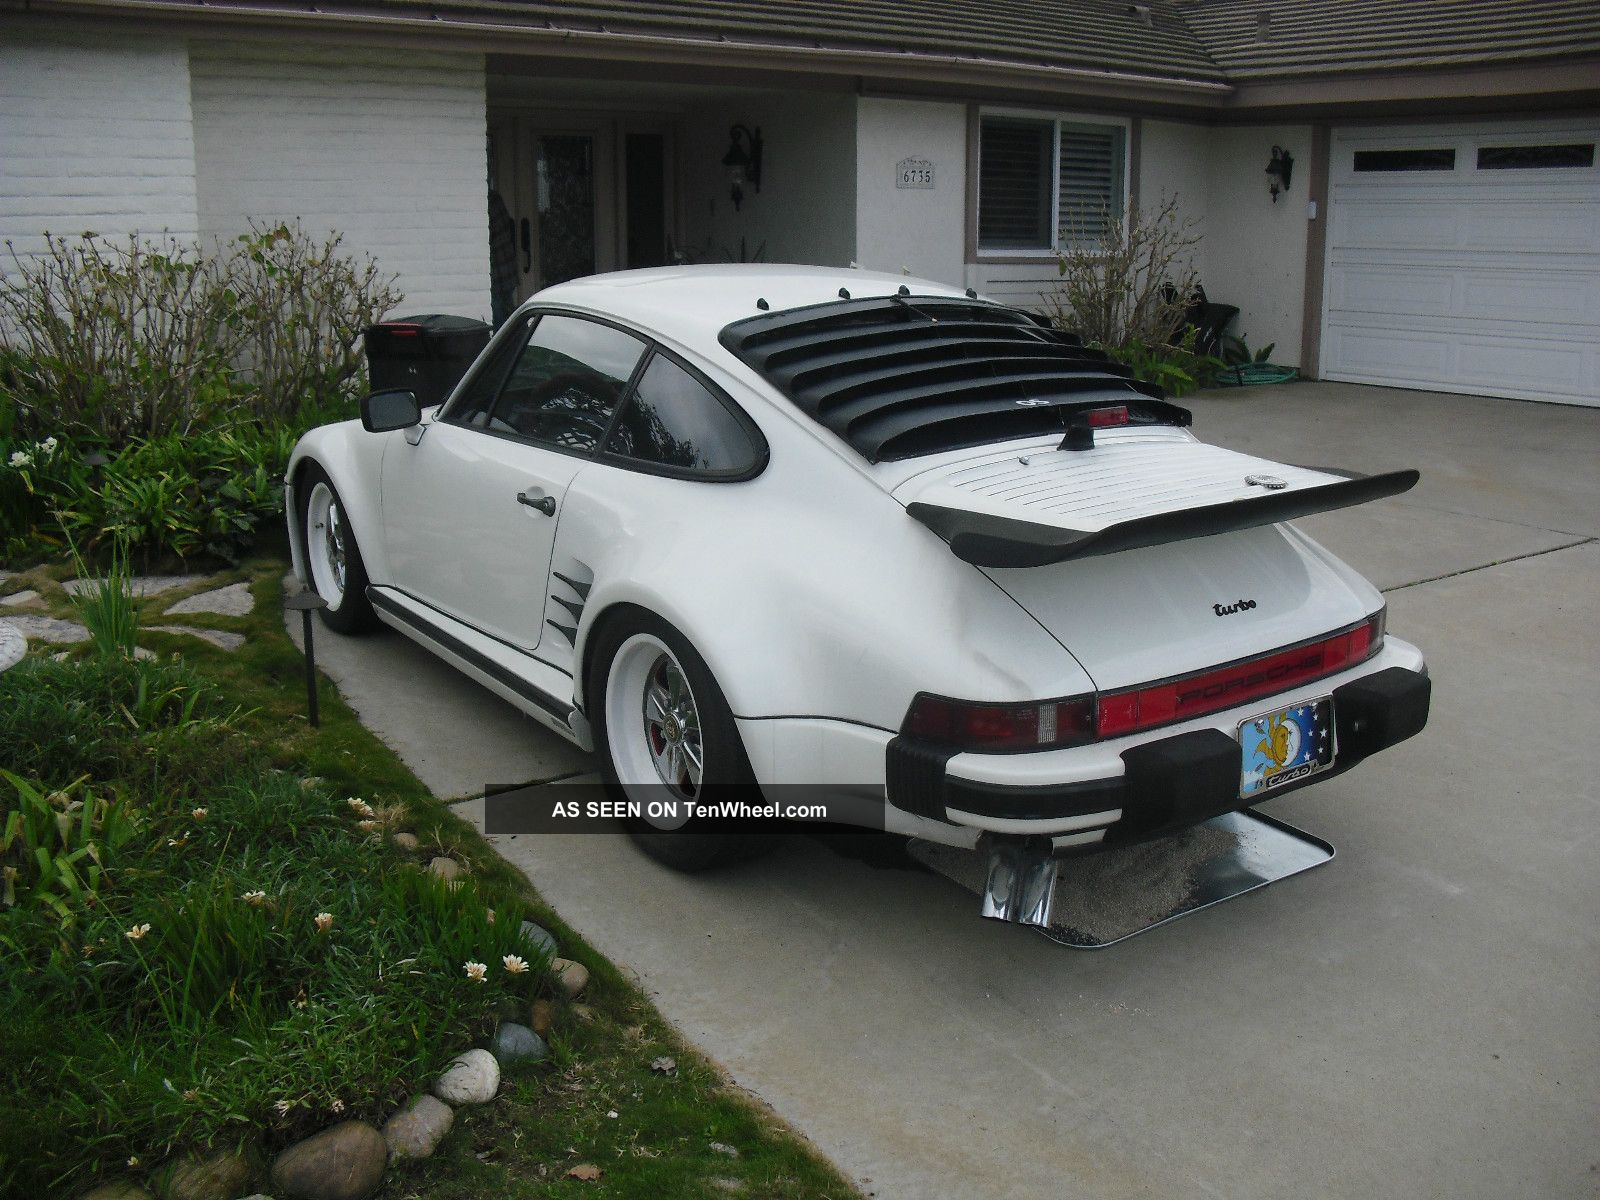 1975 Porsche 911s Turbo Slant Nose Conversion Other photo